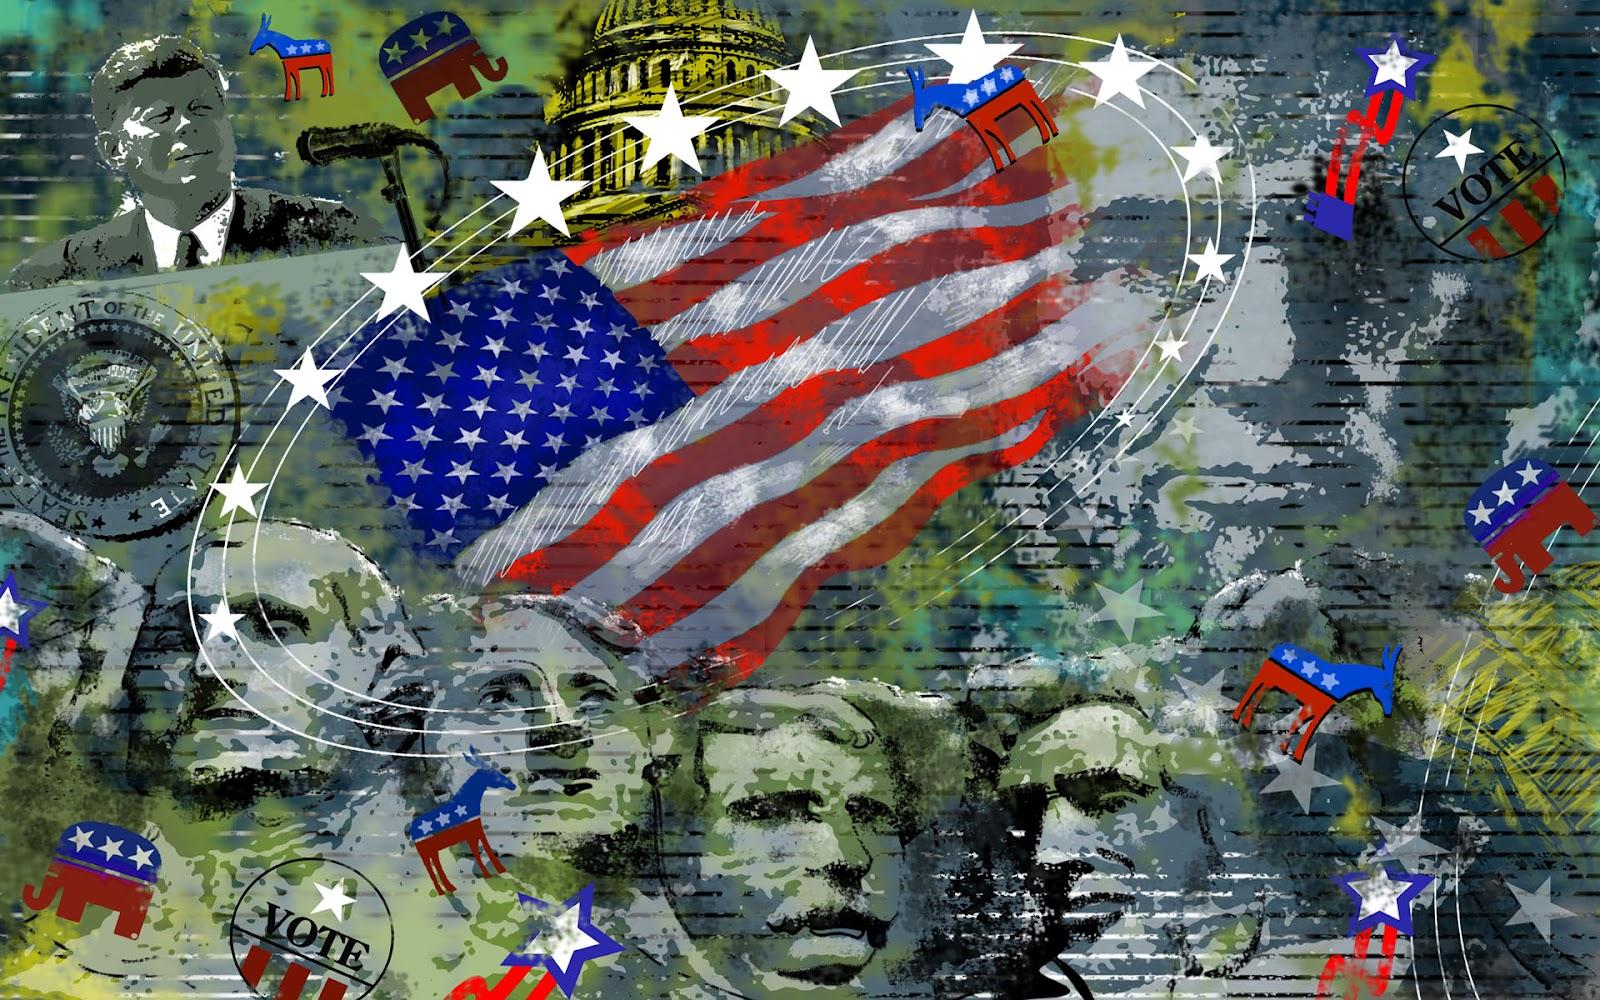 american history wallpaper - photo #29